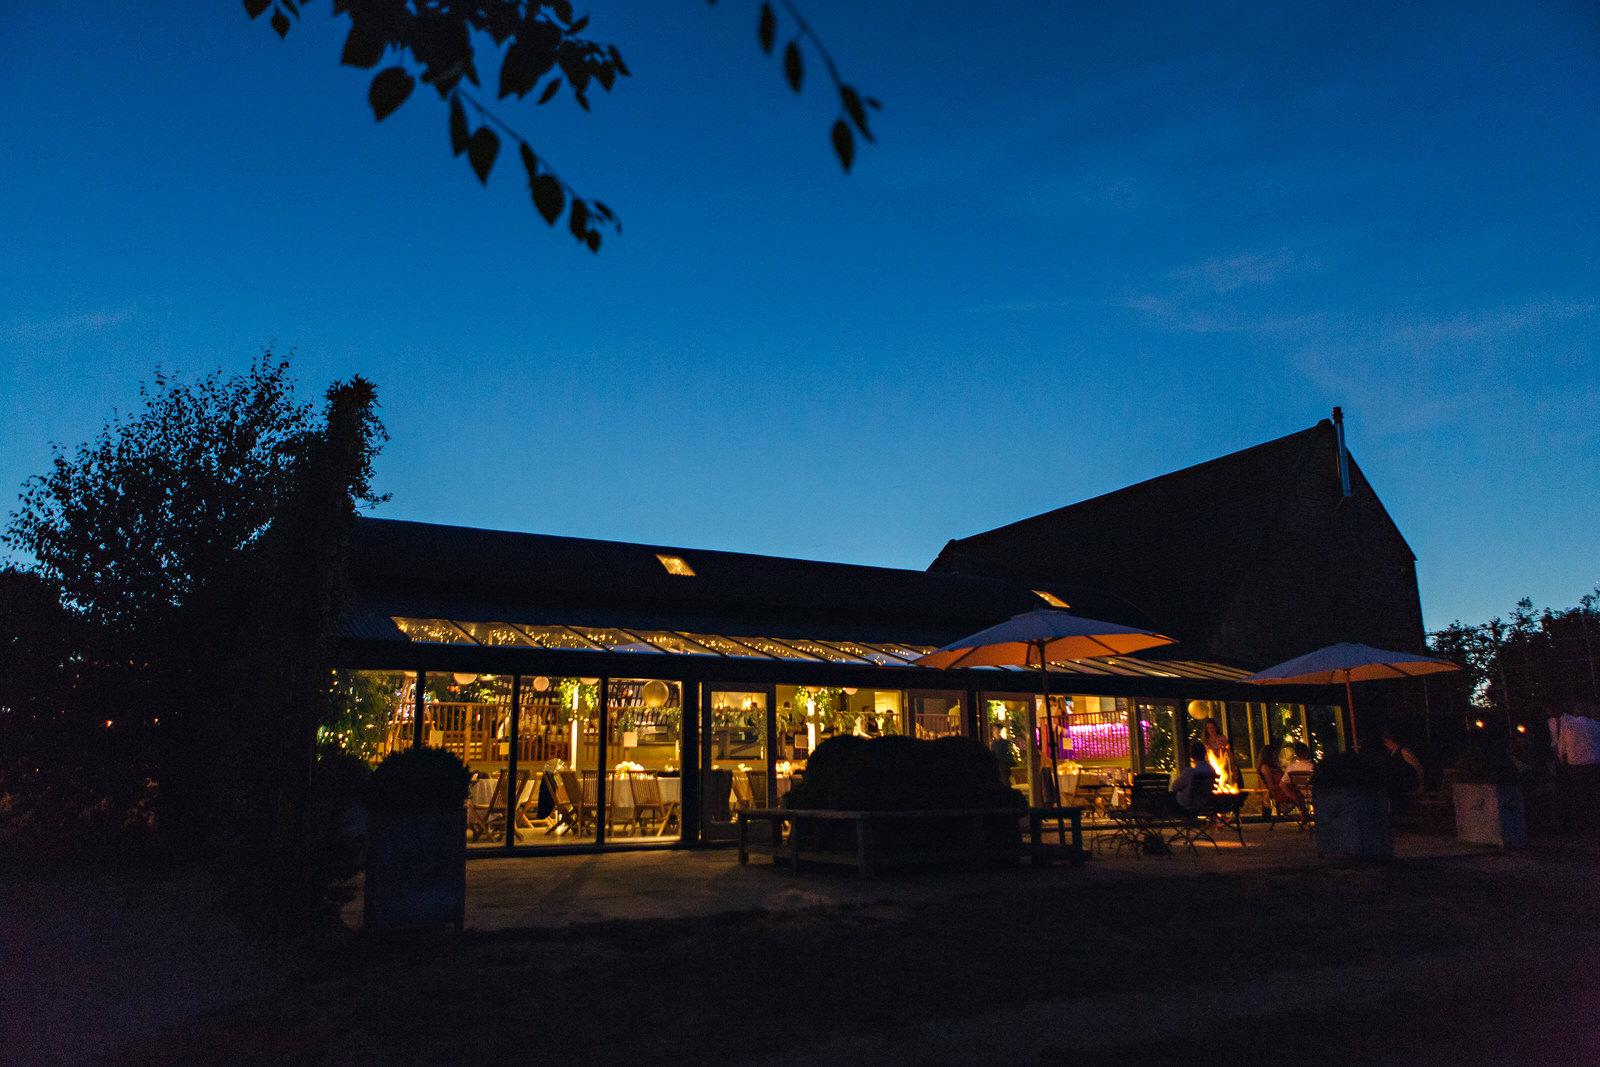 Stone Barn - Rory Lindsay Photography - 23.7.18 - Bruce & Kate -  -865stone+barn+cotswold+wedding+venue.jpg